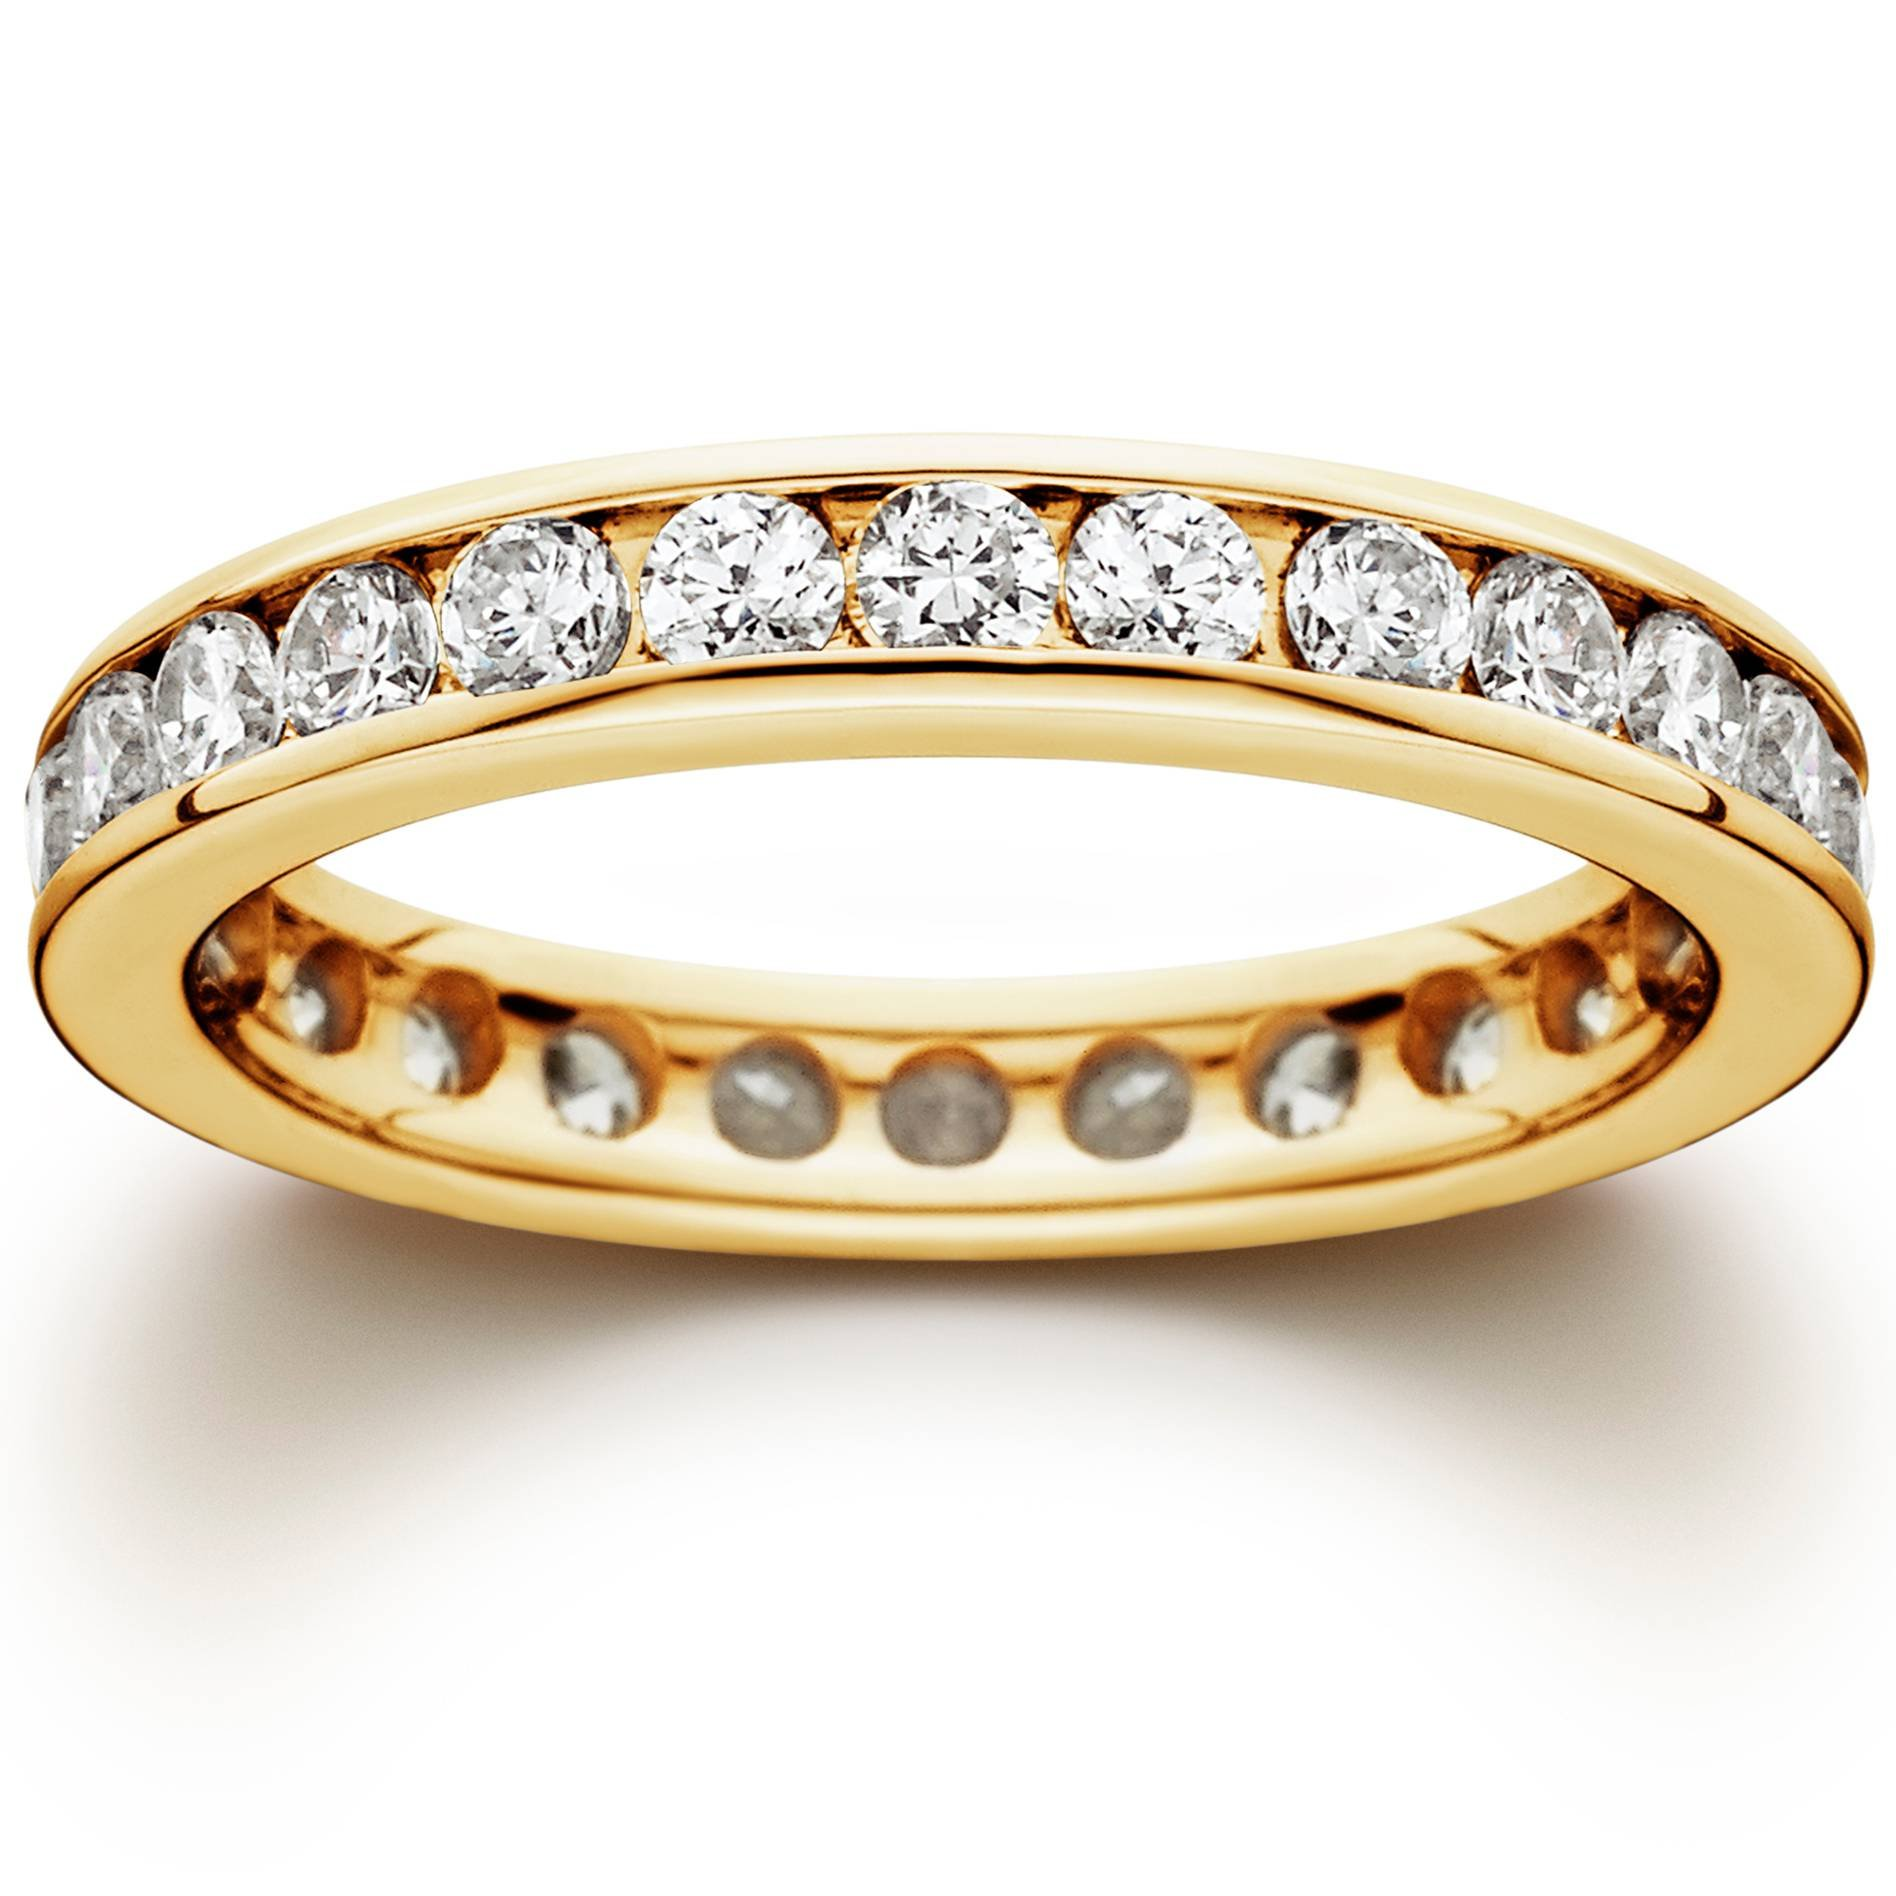 1 1/2 CT Channel Set Eternity Diamond Ring 14K Yellow Gold - Size 8